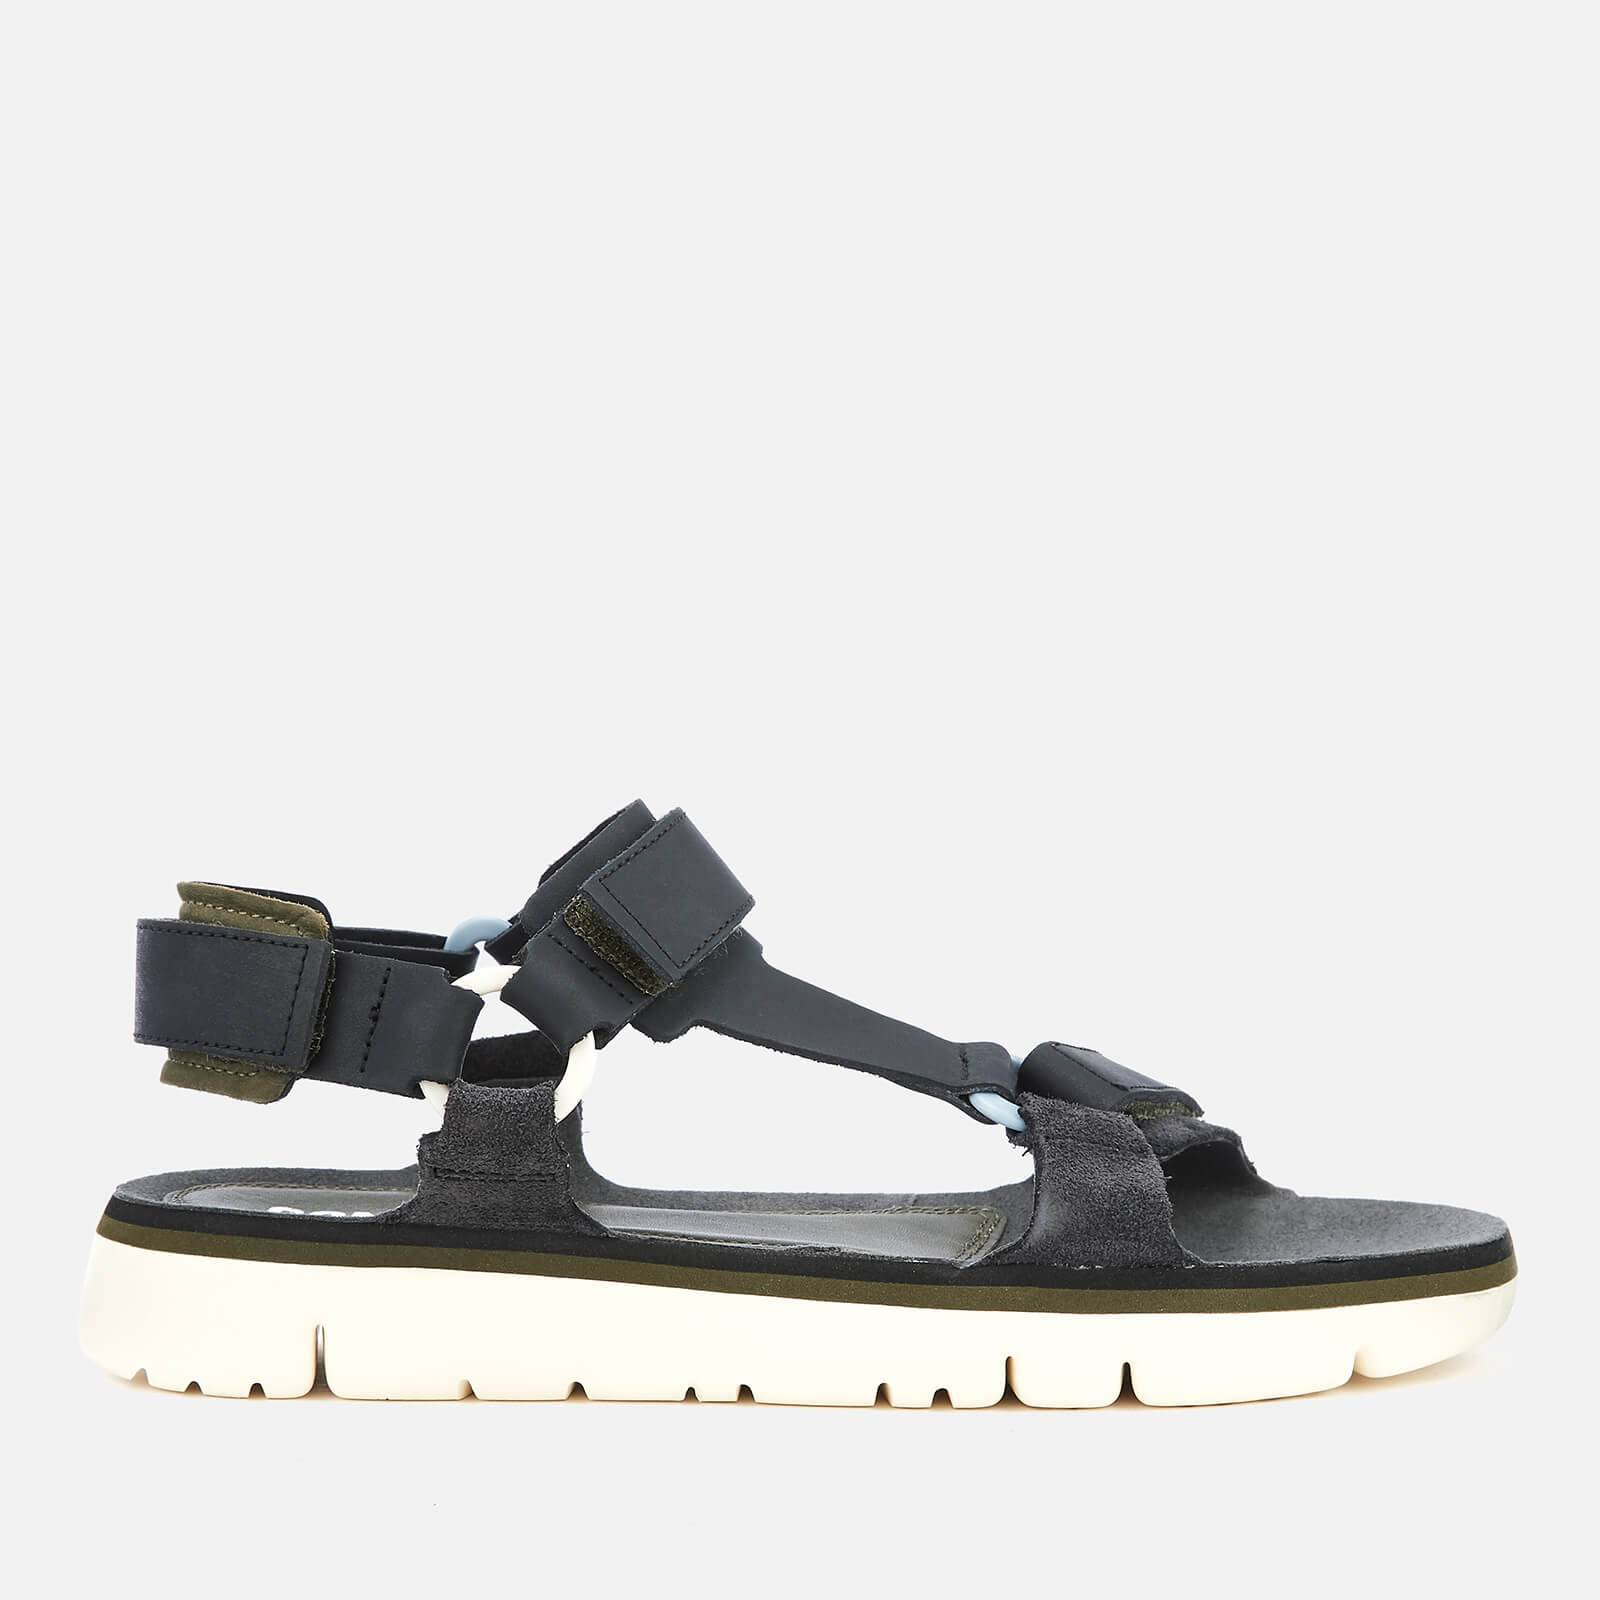 Camper Men's Oruga Sandals - Multi - UK 11 - Black